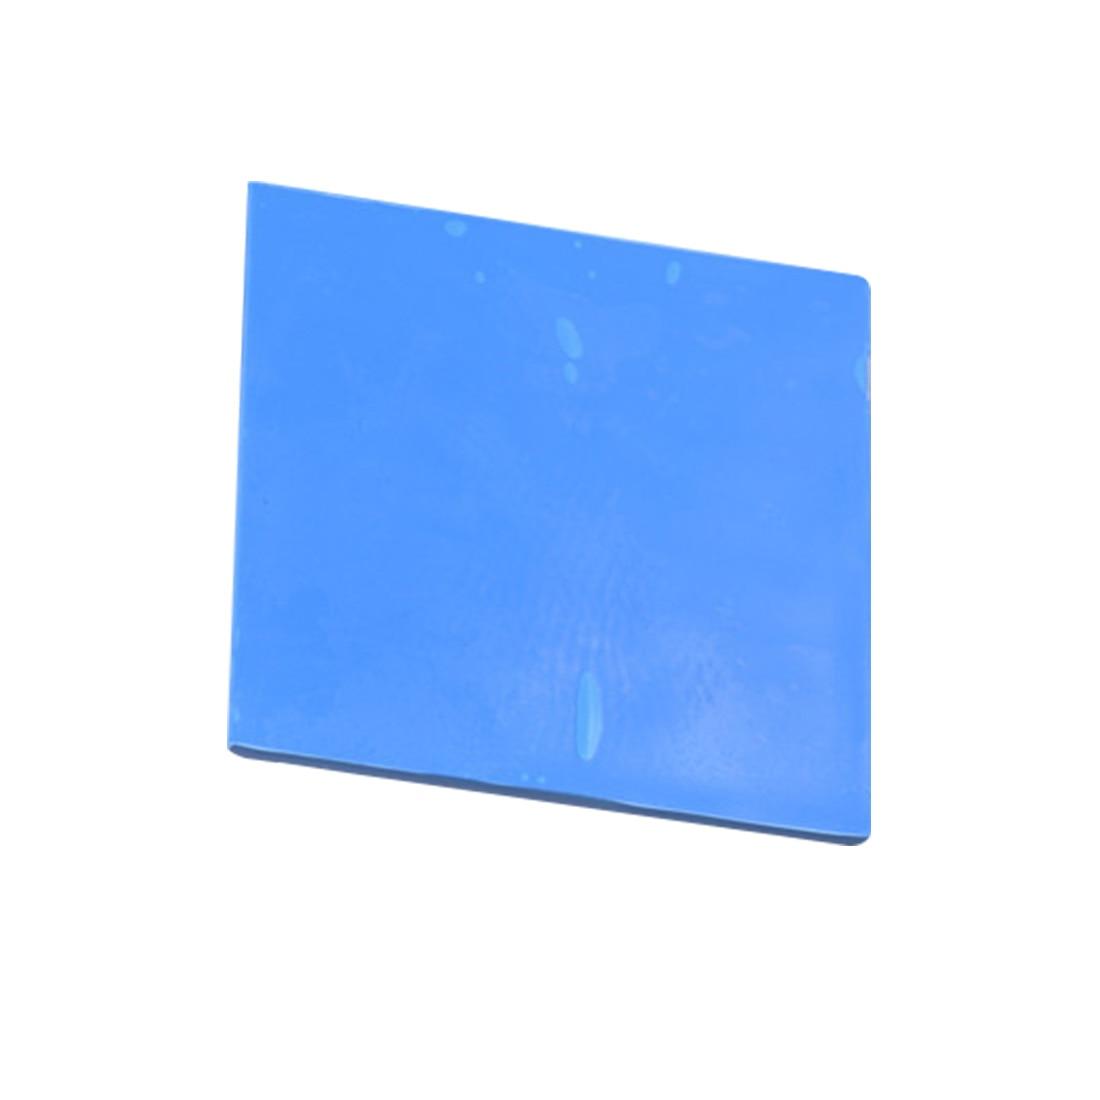 Etmakit  100mm*100mm*0.5mm GPU CPU Heatsink Cooling Conductive Silicone Pad Thermal Pad 100